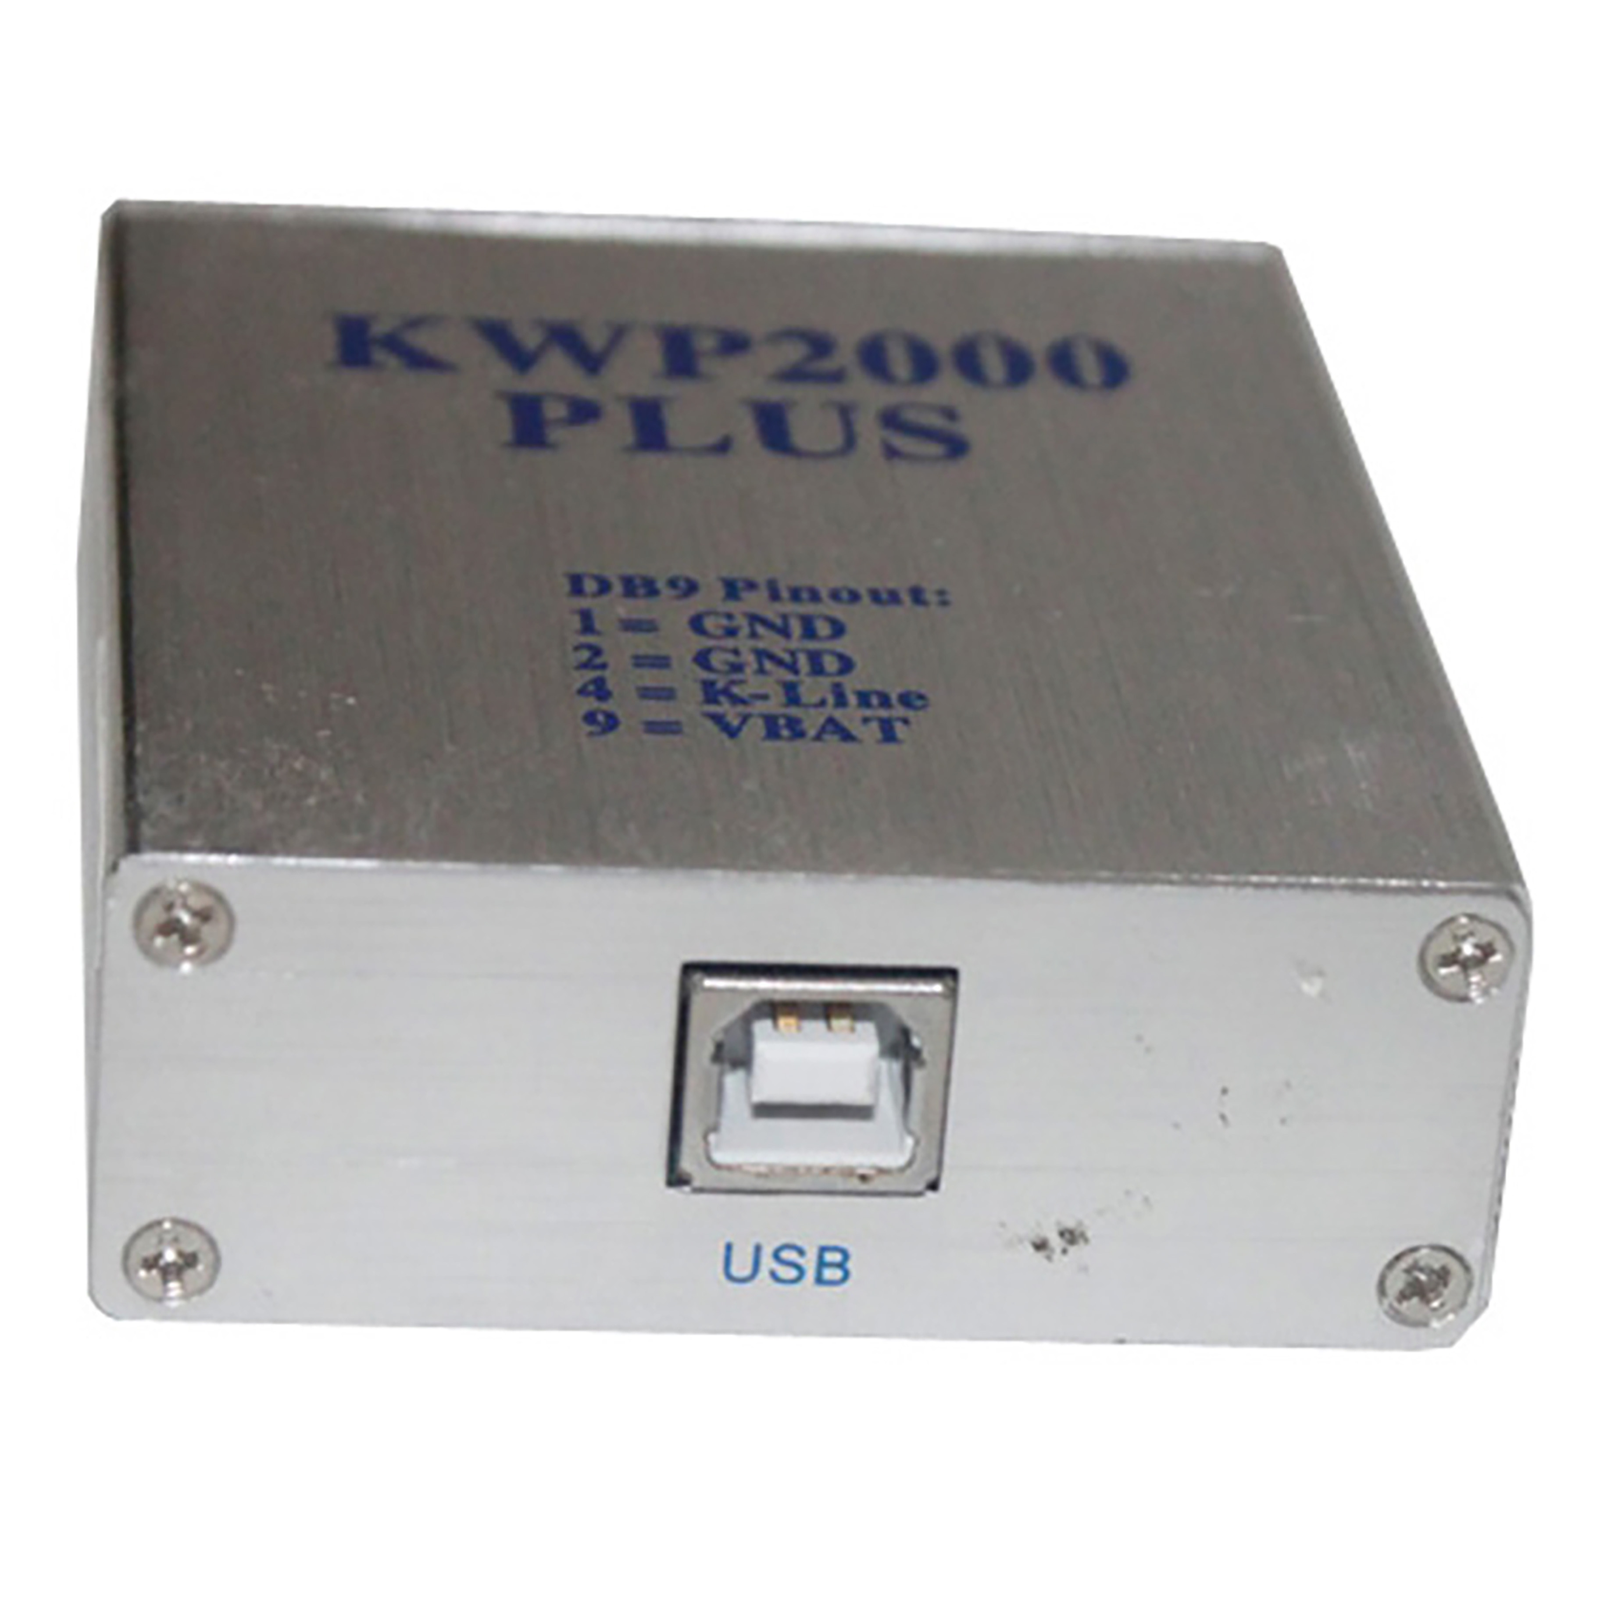 Cablematic Adaptador USB a OBD2 protocolo KWP2000 Plus